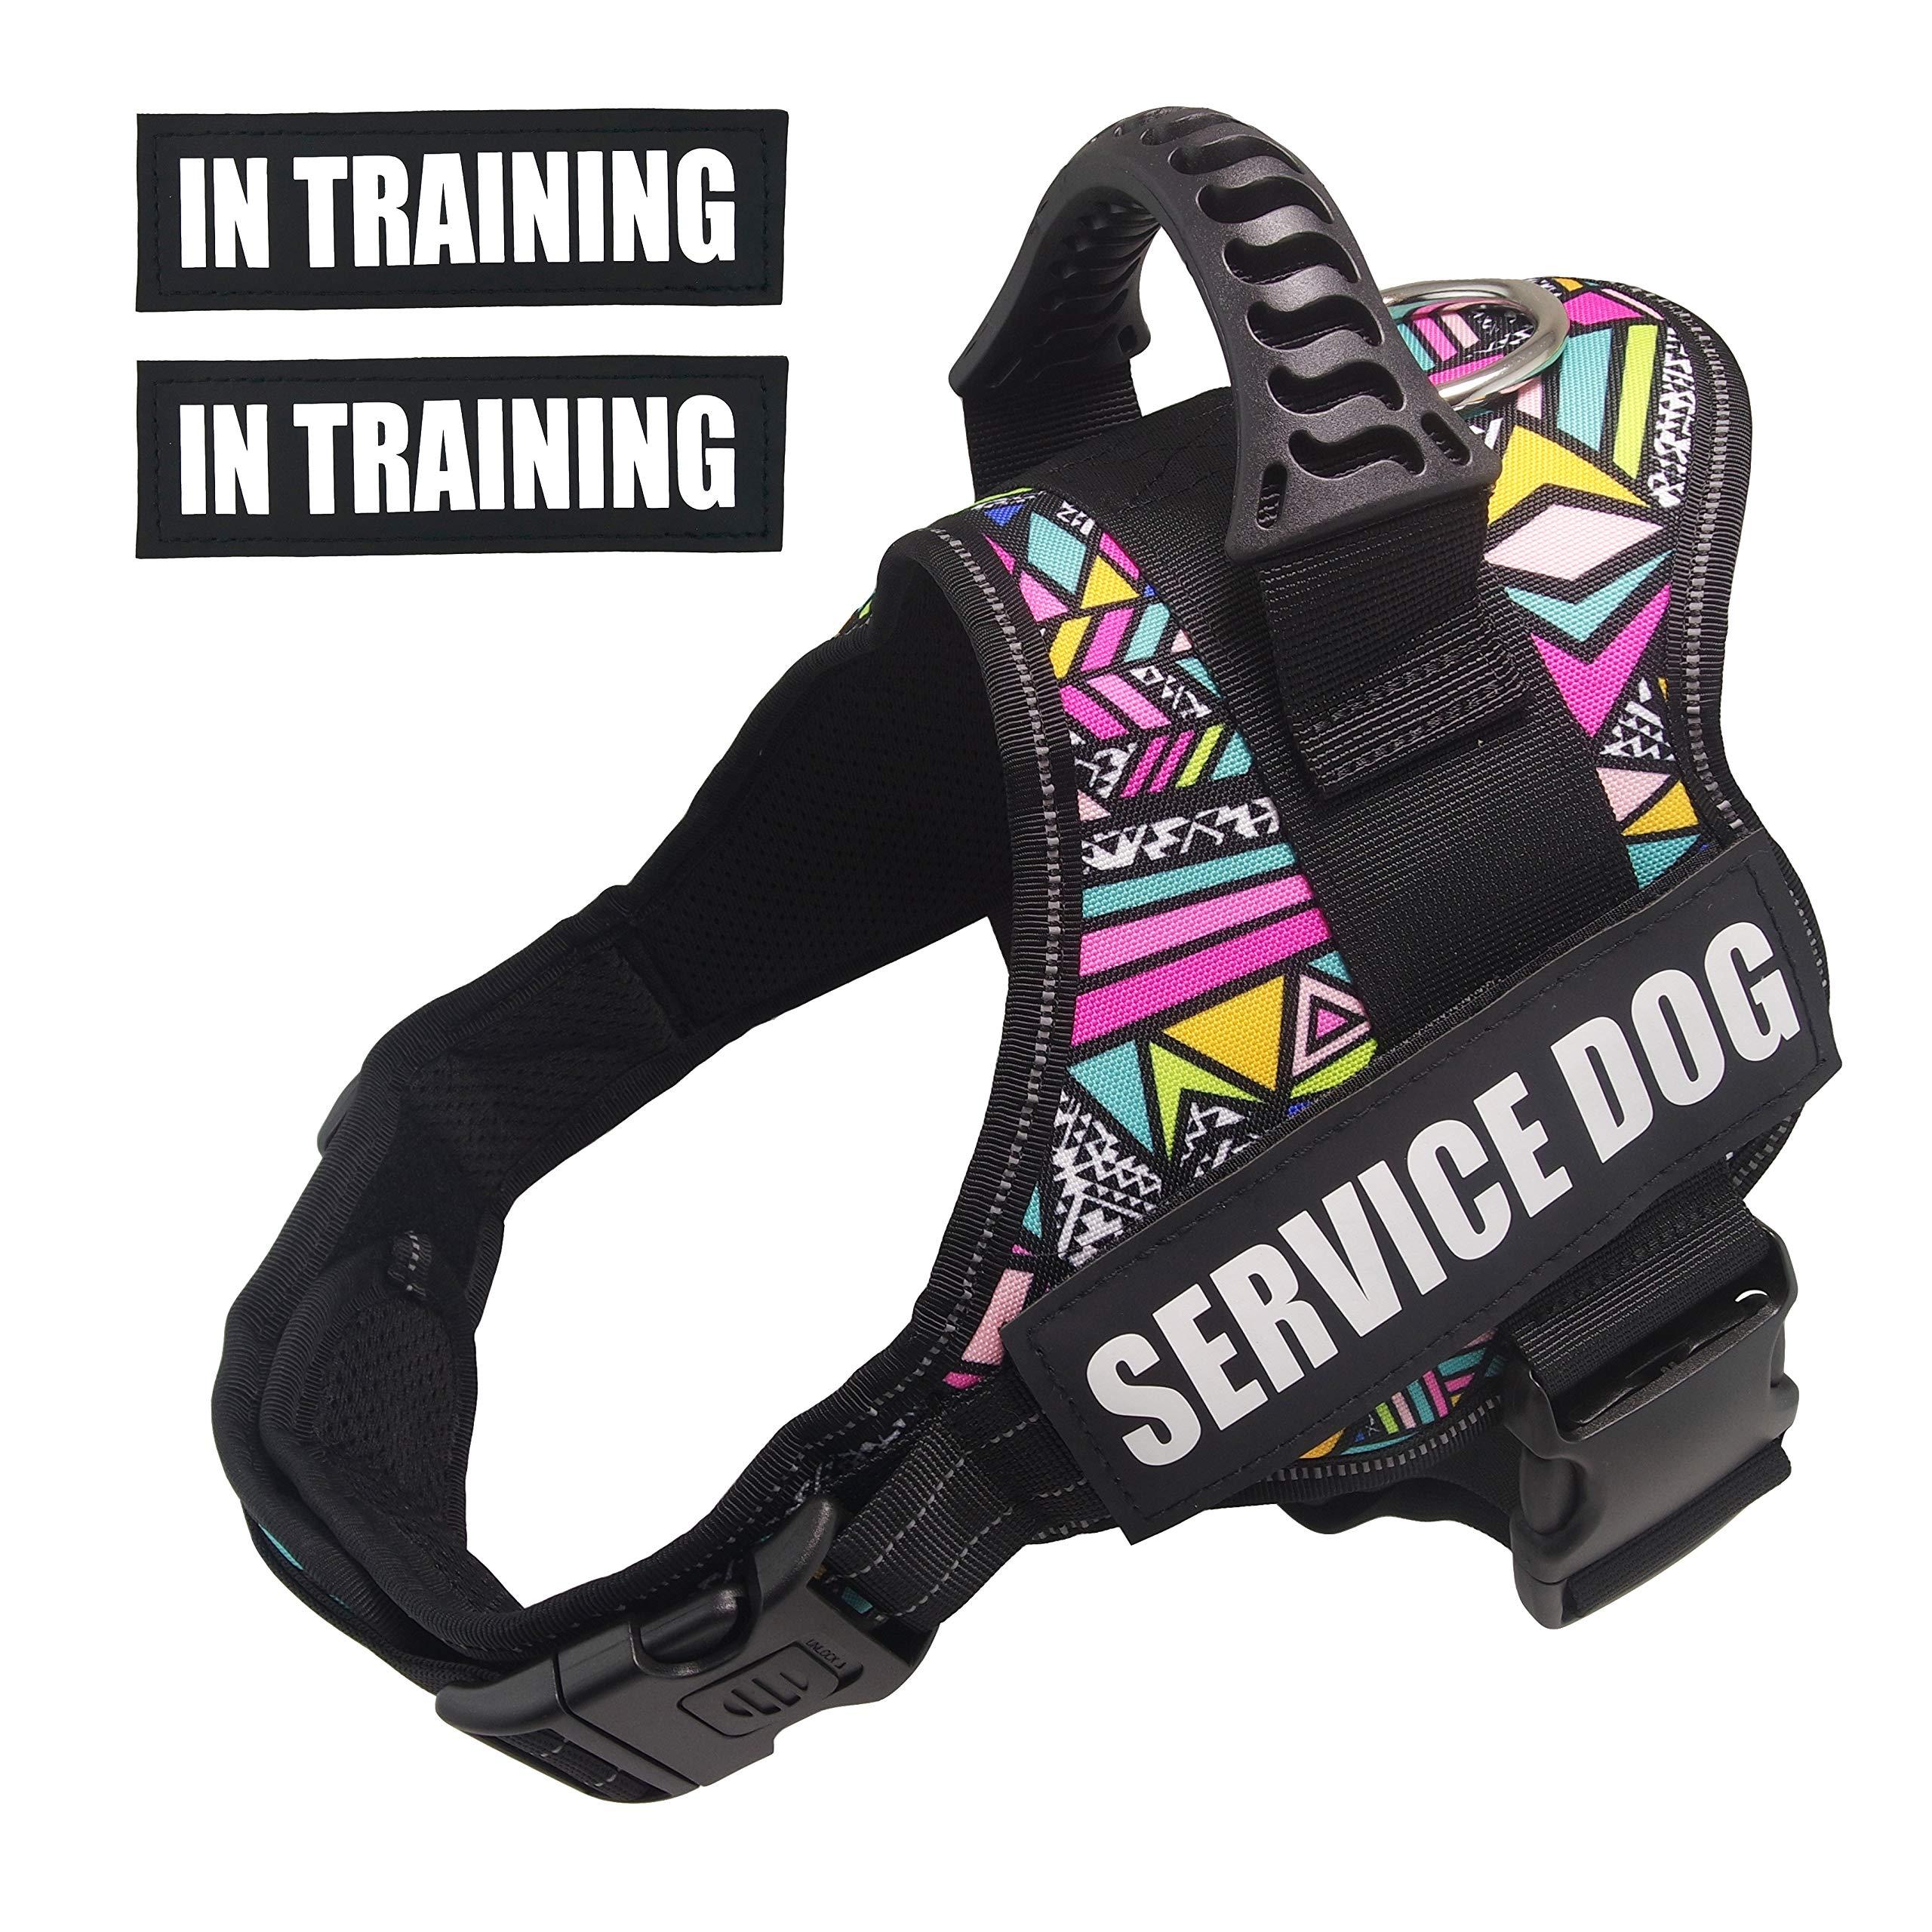 Dihapet Dog Harness, Service Dog Vest, No Pull No Choke Dog Vest for Training Walking Jogging (M Chest 24-31in, Colorful Rhomboids)